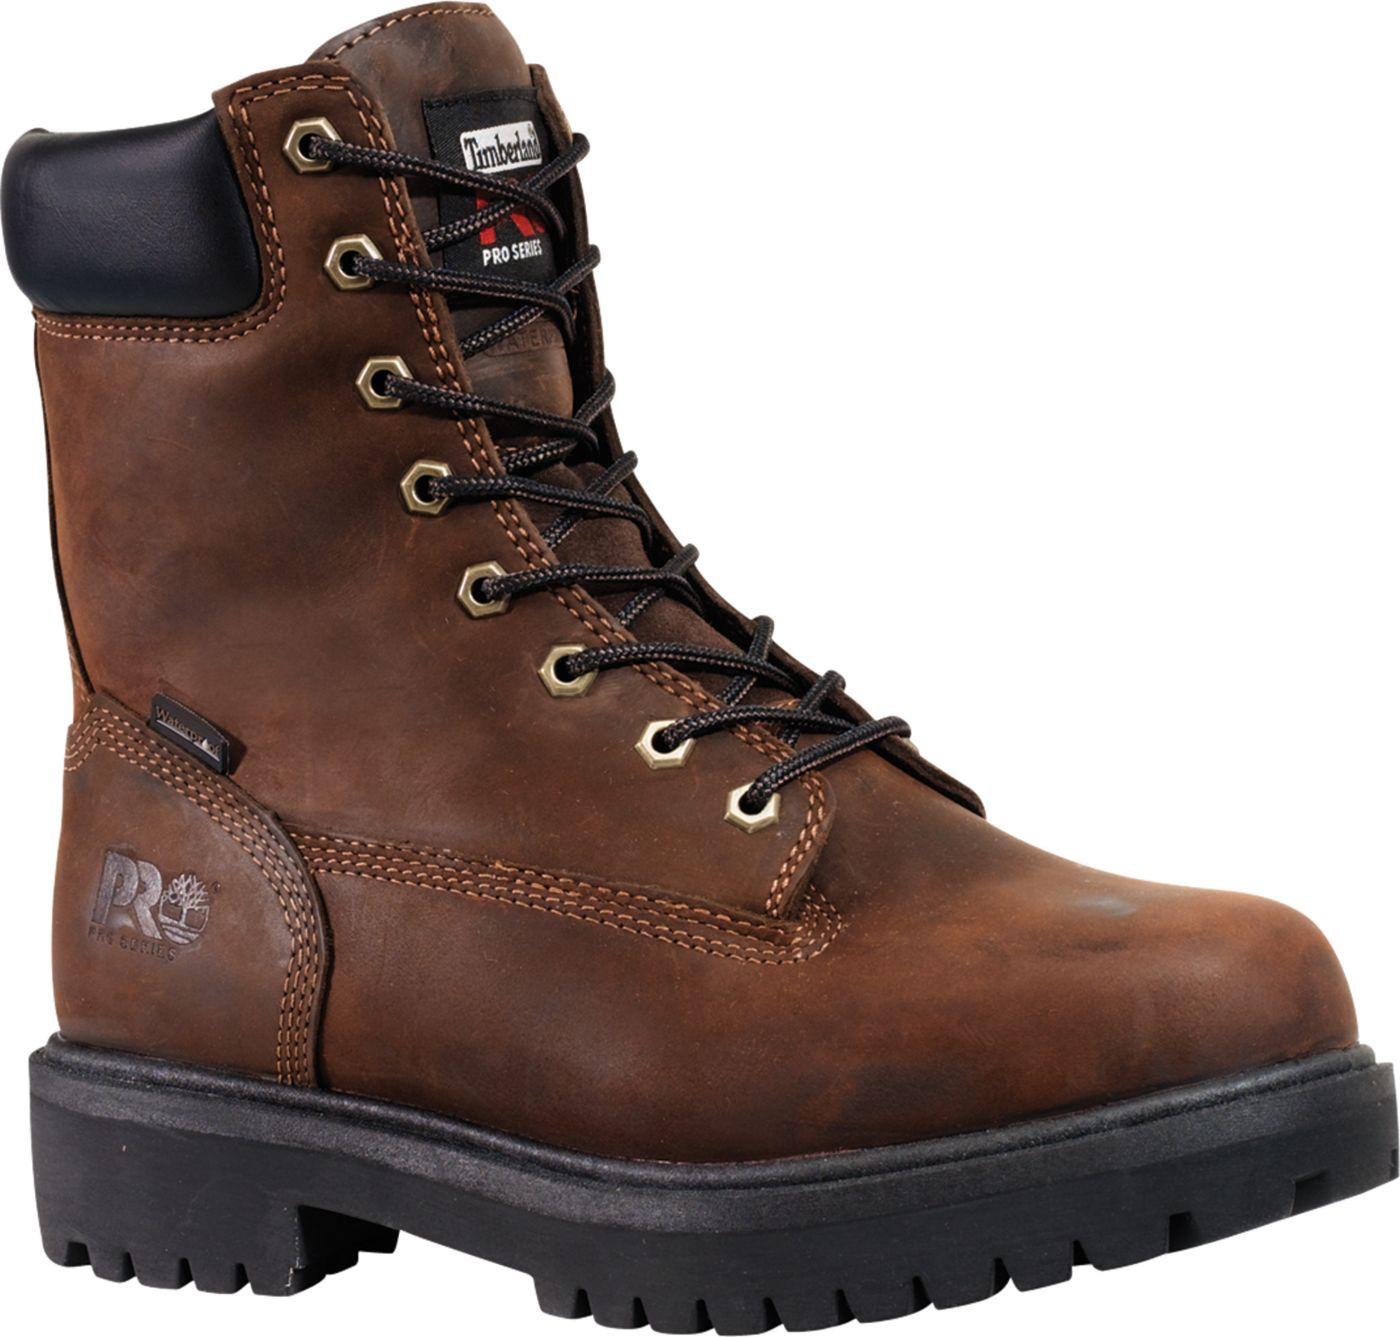 Timberland PRO Men's Direct Attach 8'' Waterproof 400g Work Boots